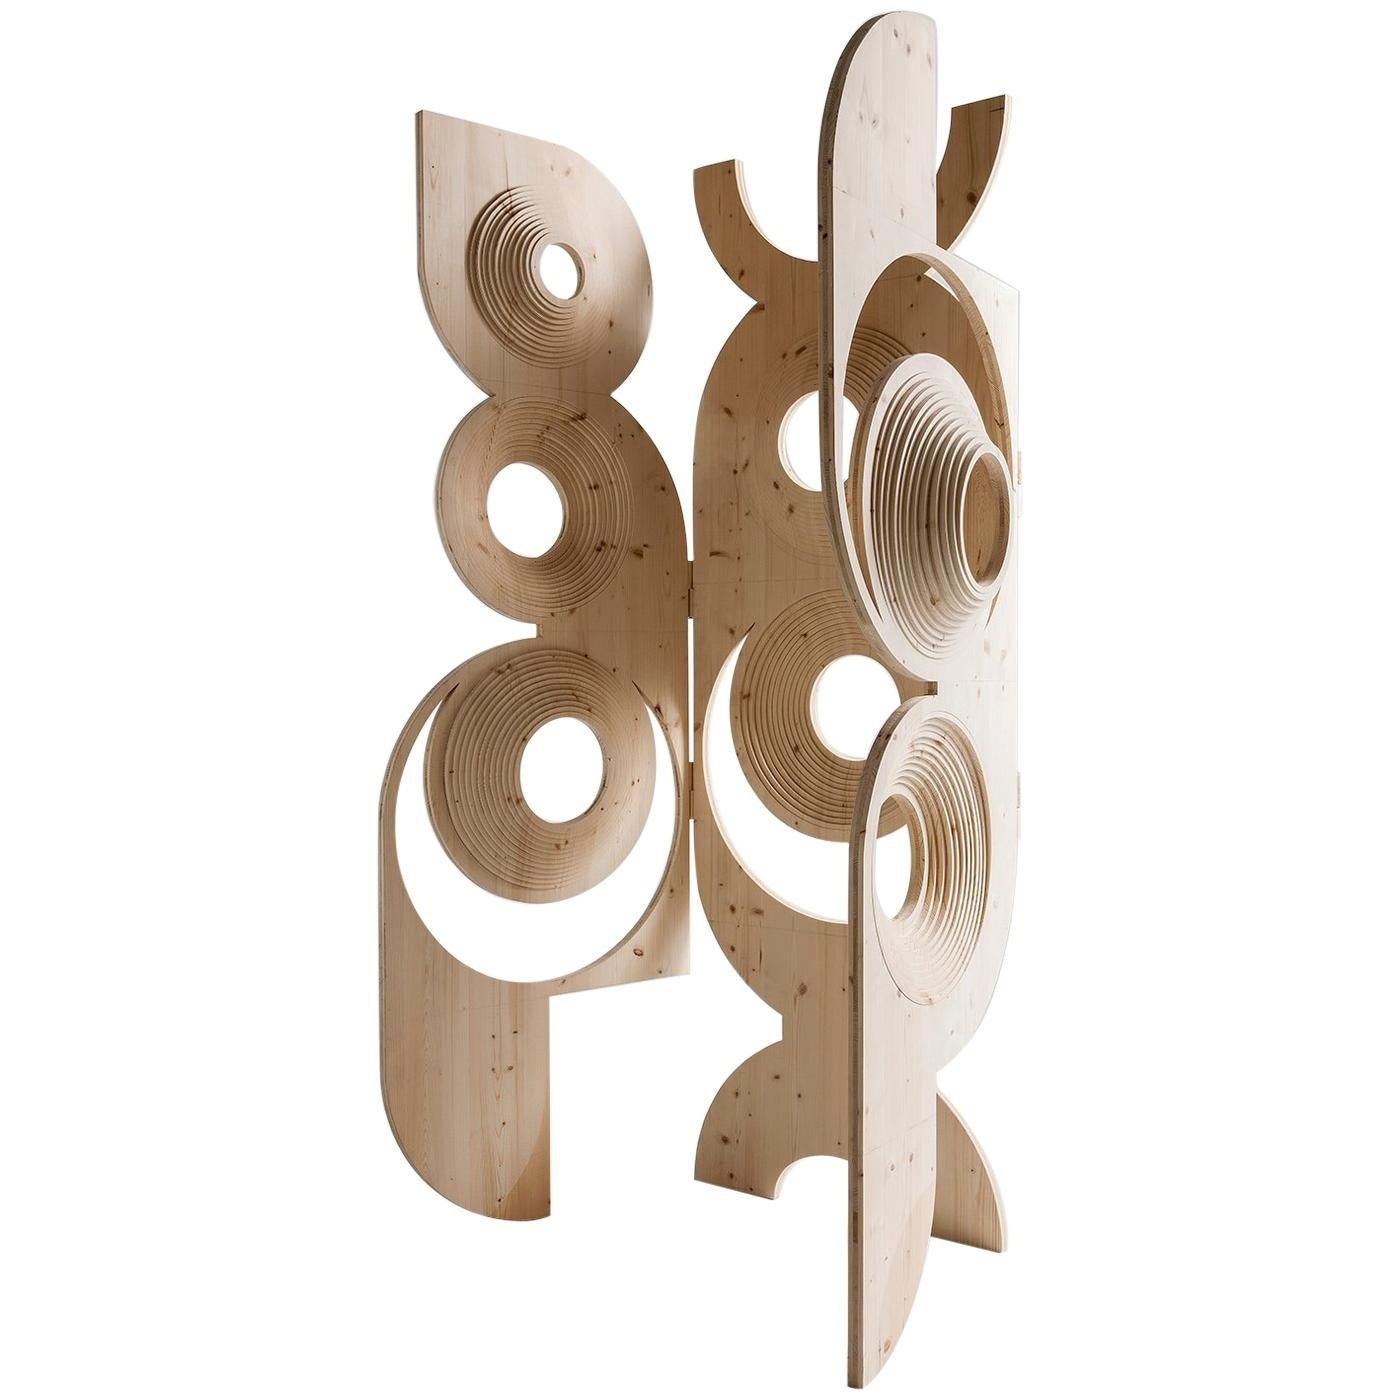 Modern  Sculptural Wood Room Divider by Sebastiano Bottos, Italia